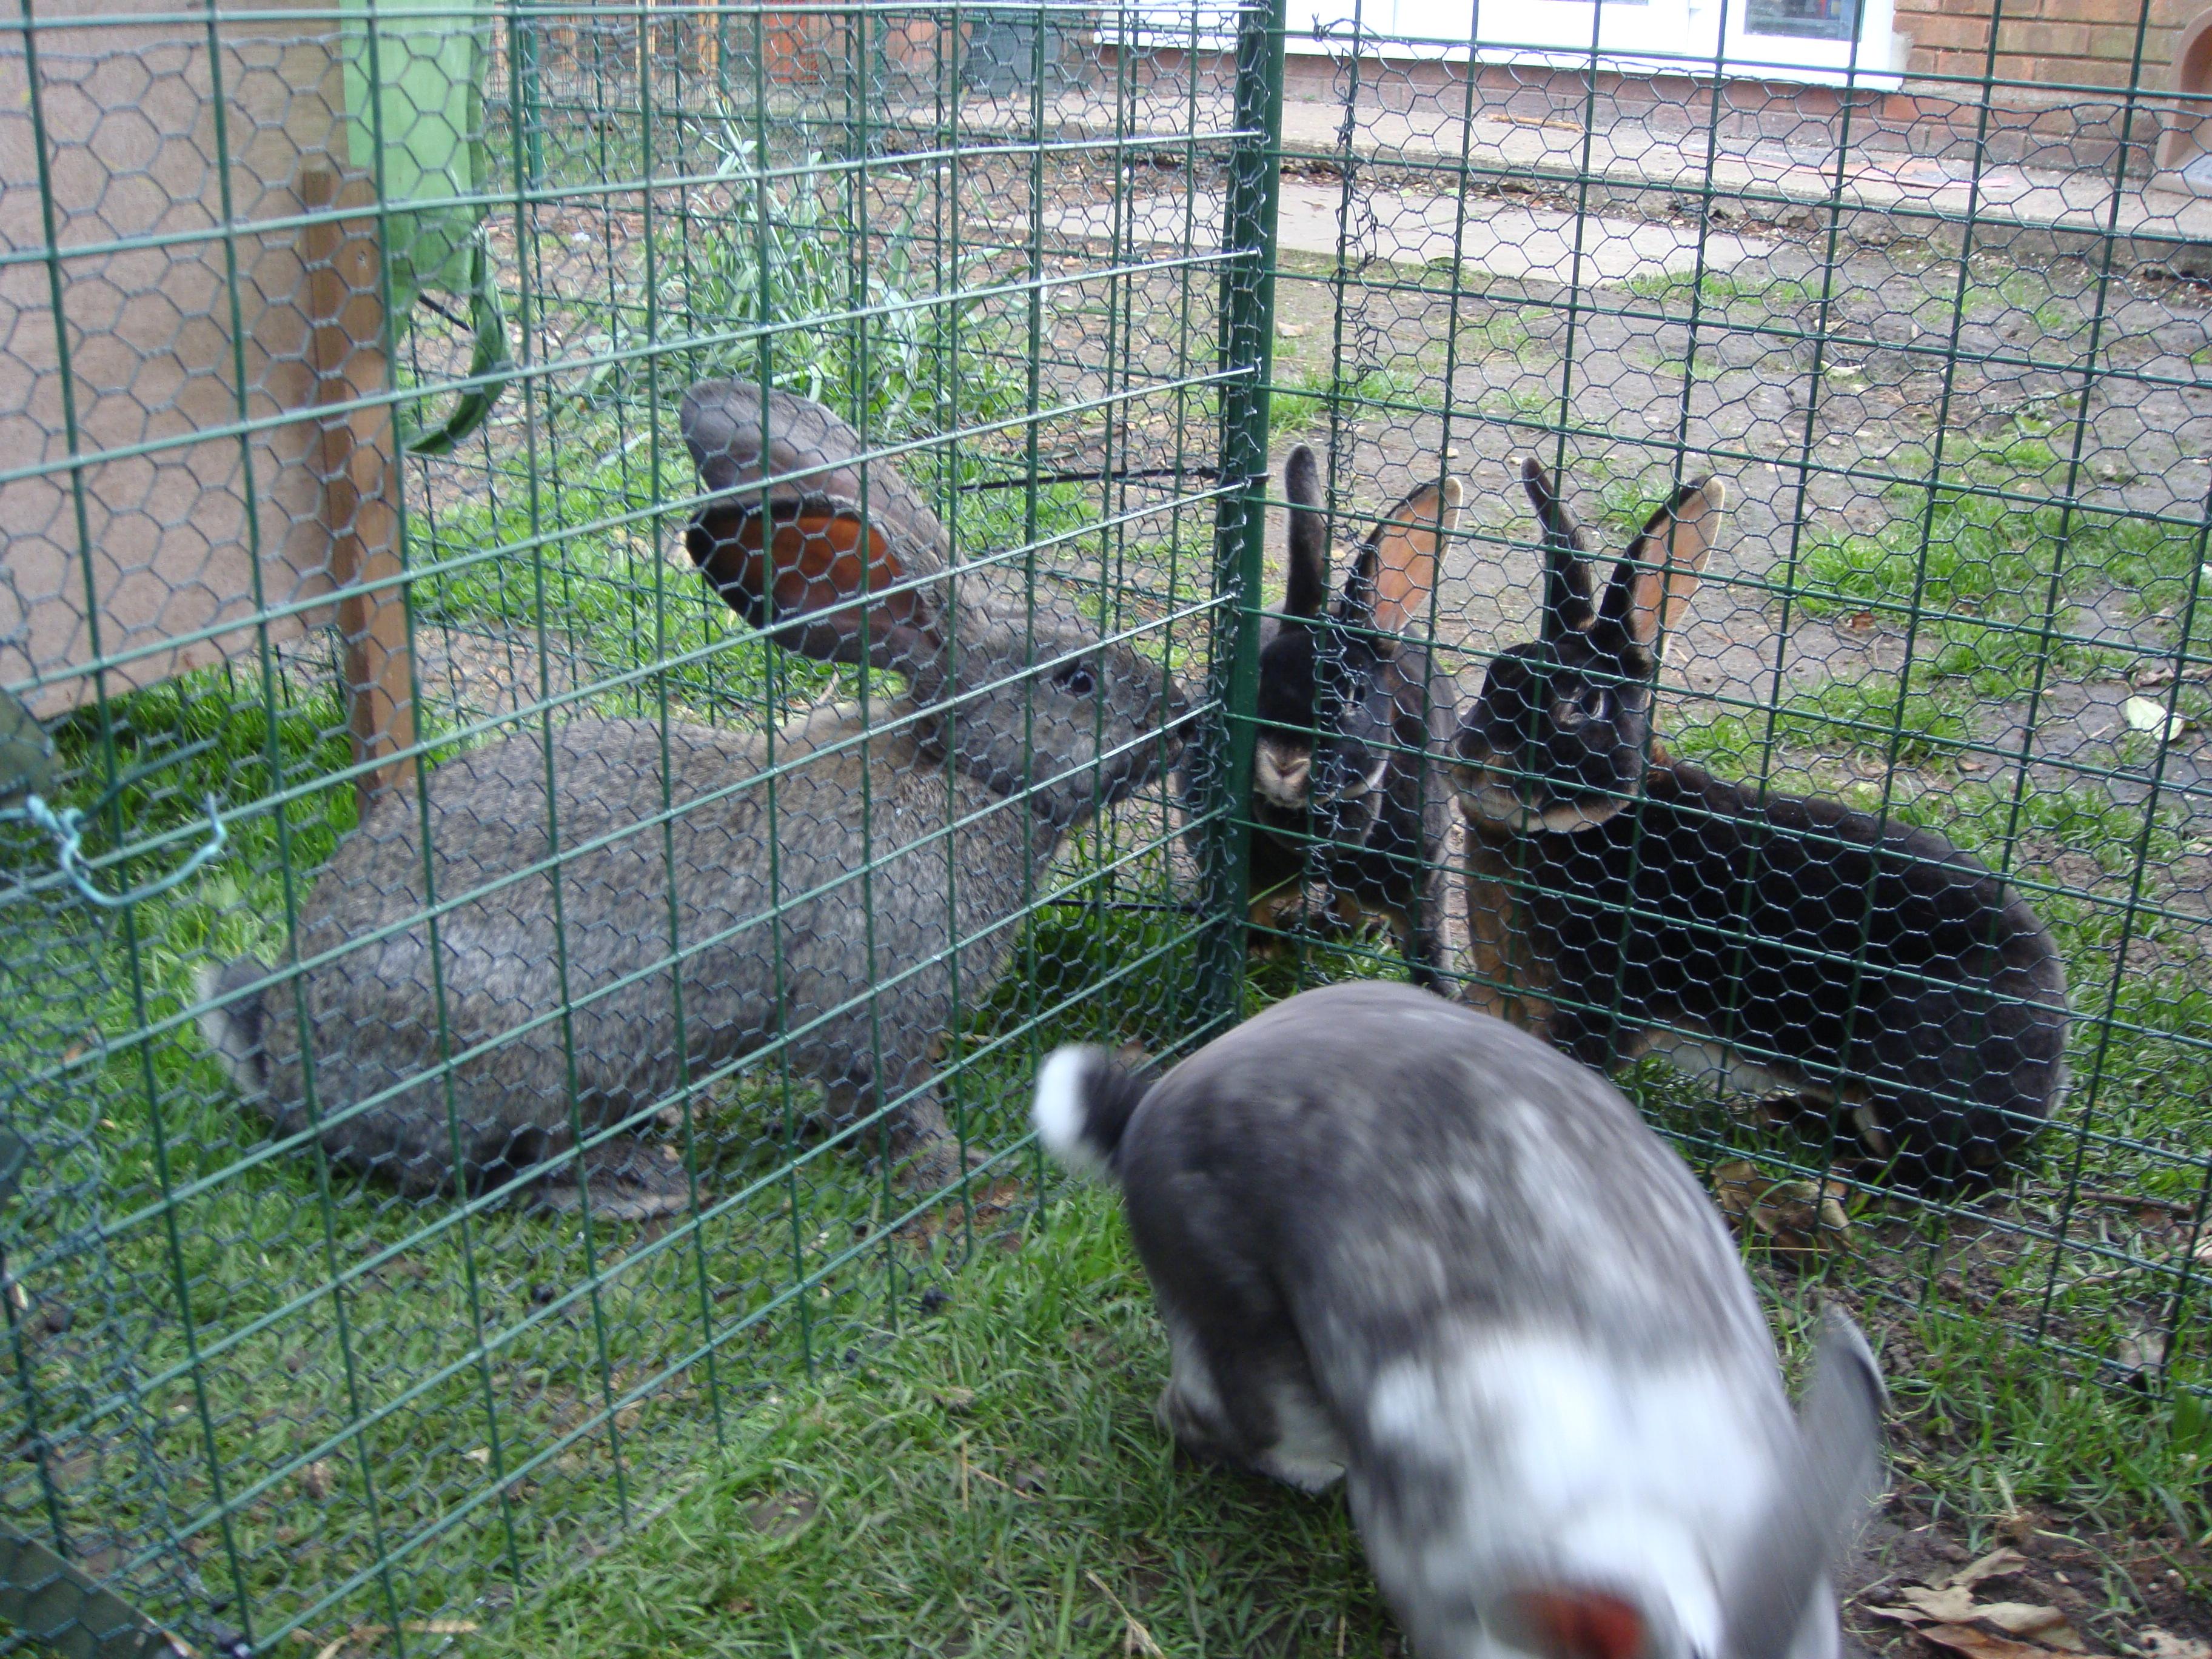 rabbit pictures 2009 006.jpg